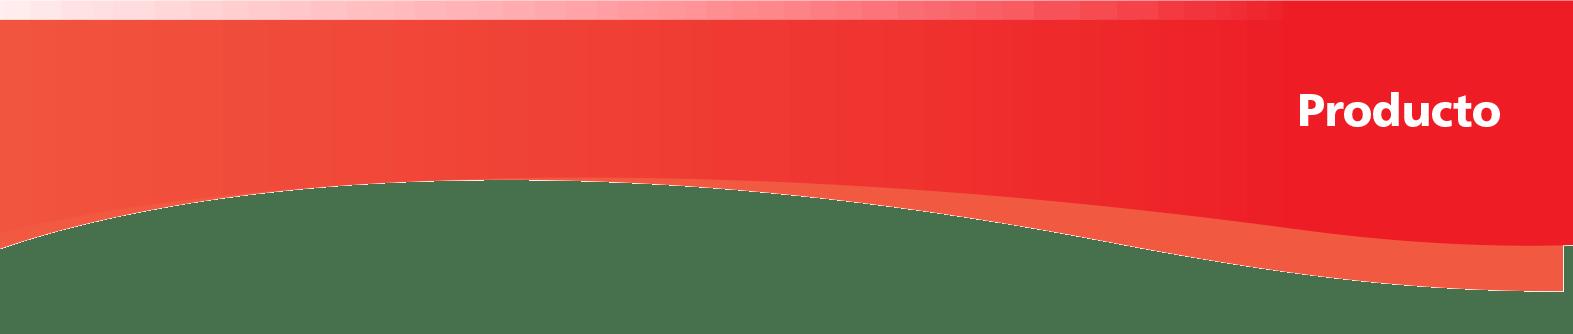 producto-cabecera